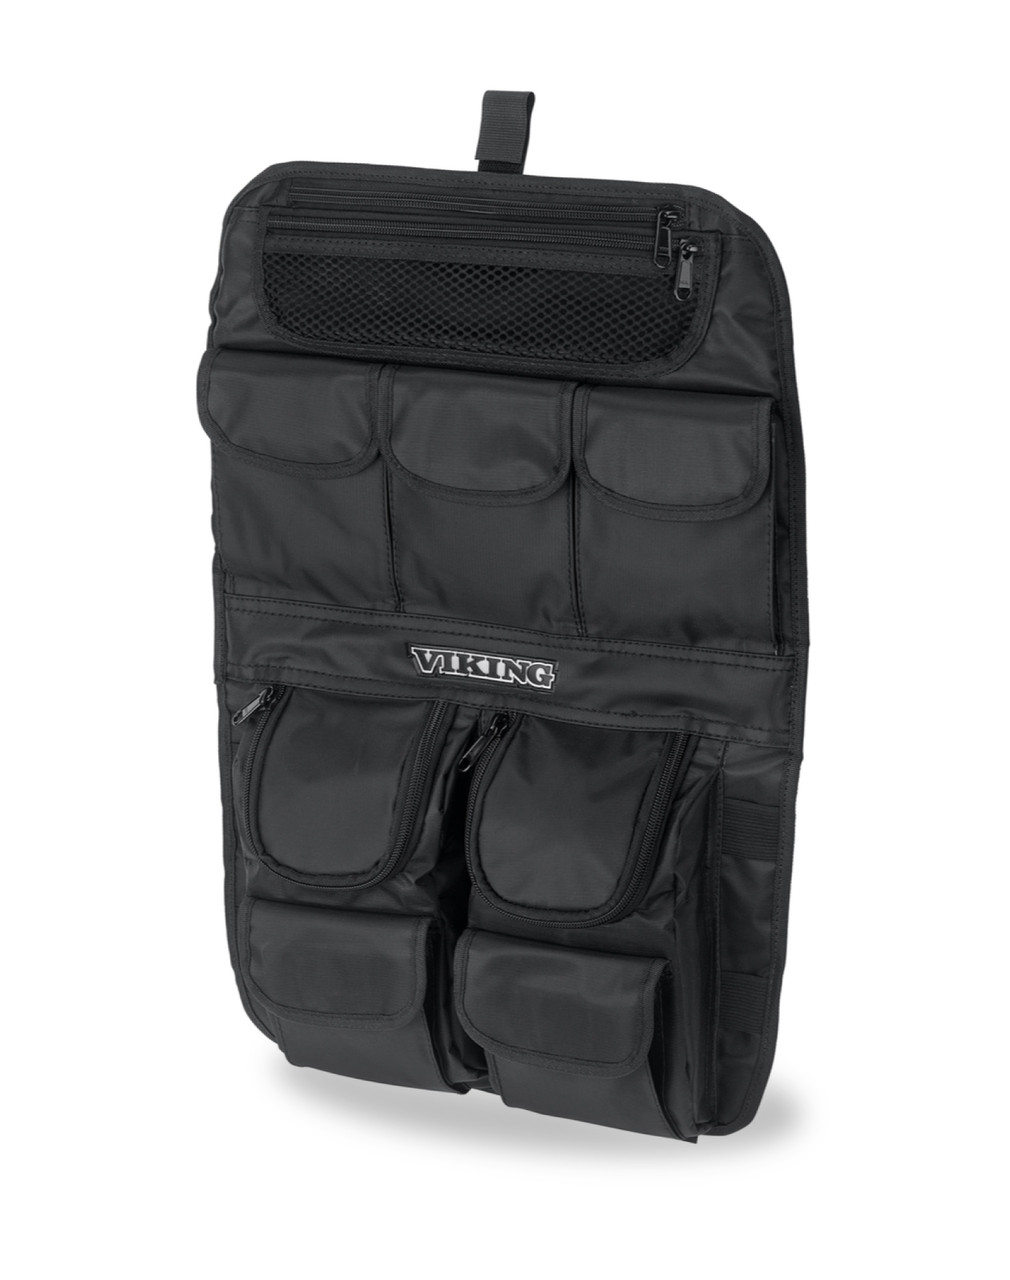 Honda Viking Tour-Pak Lid Organizer Main Bag View